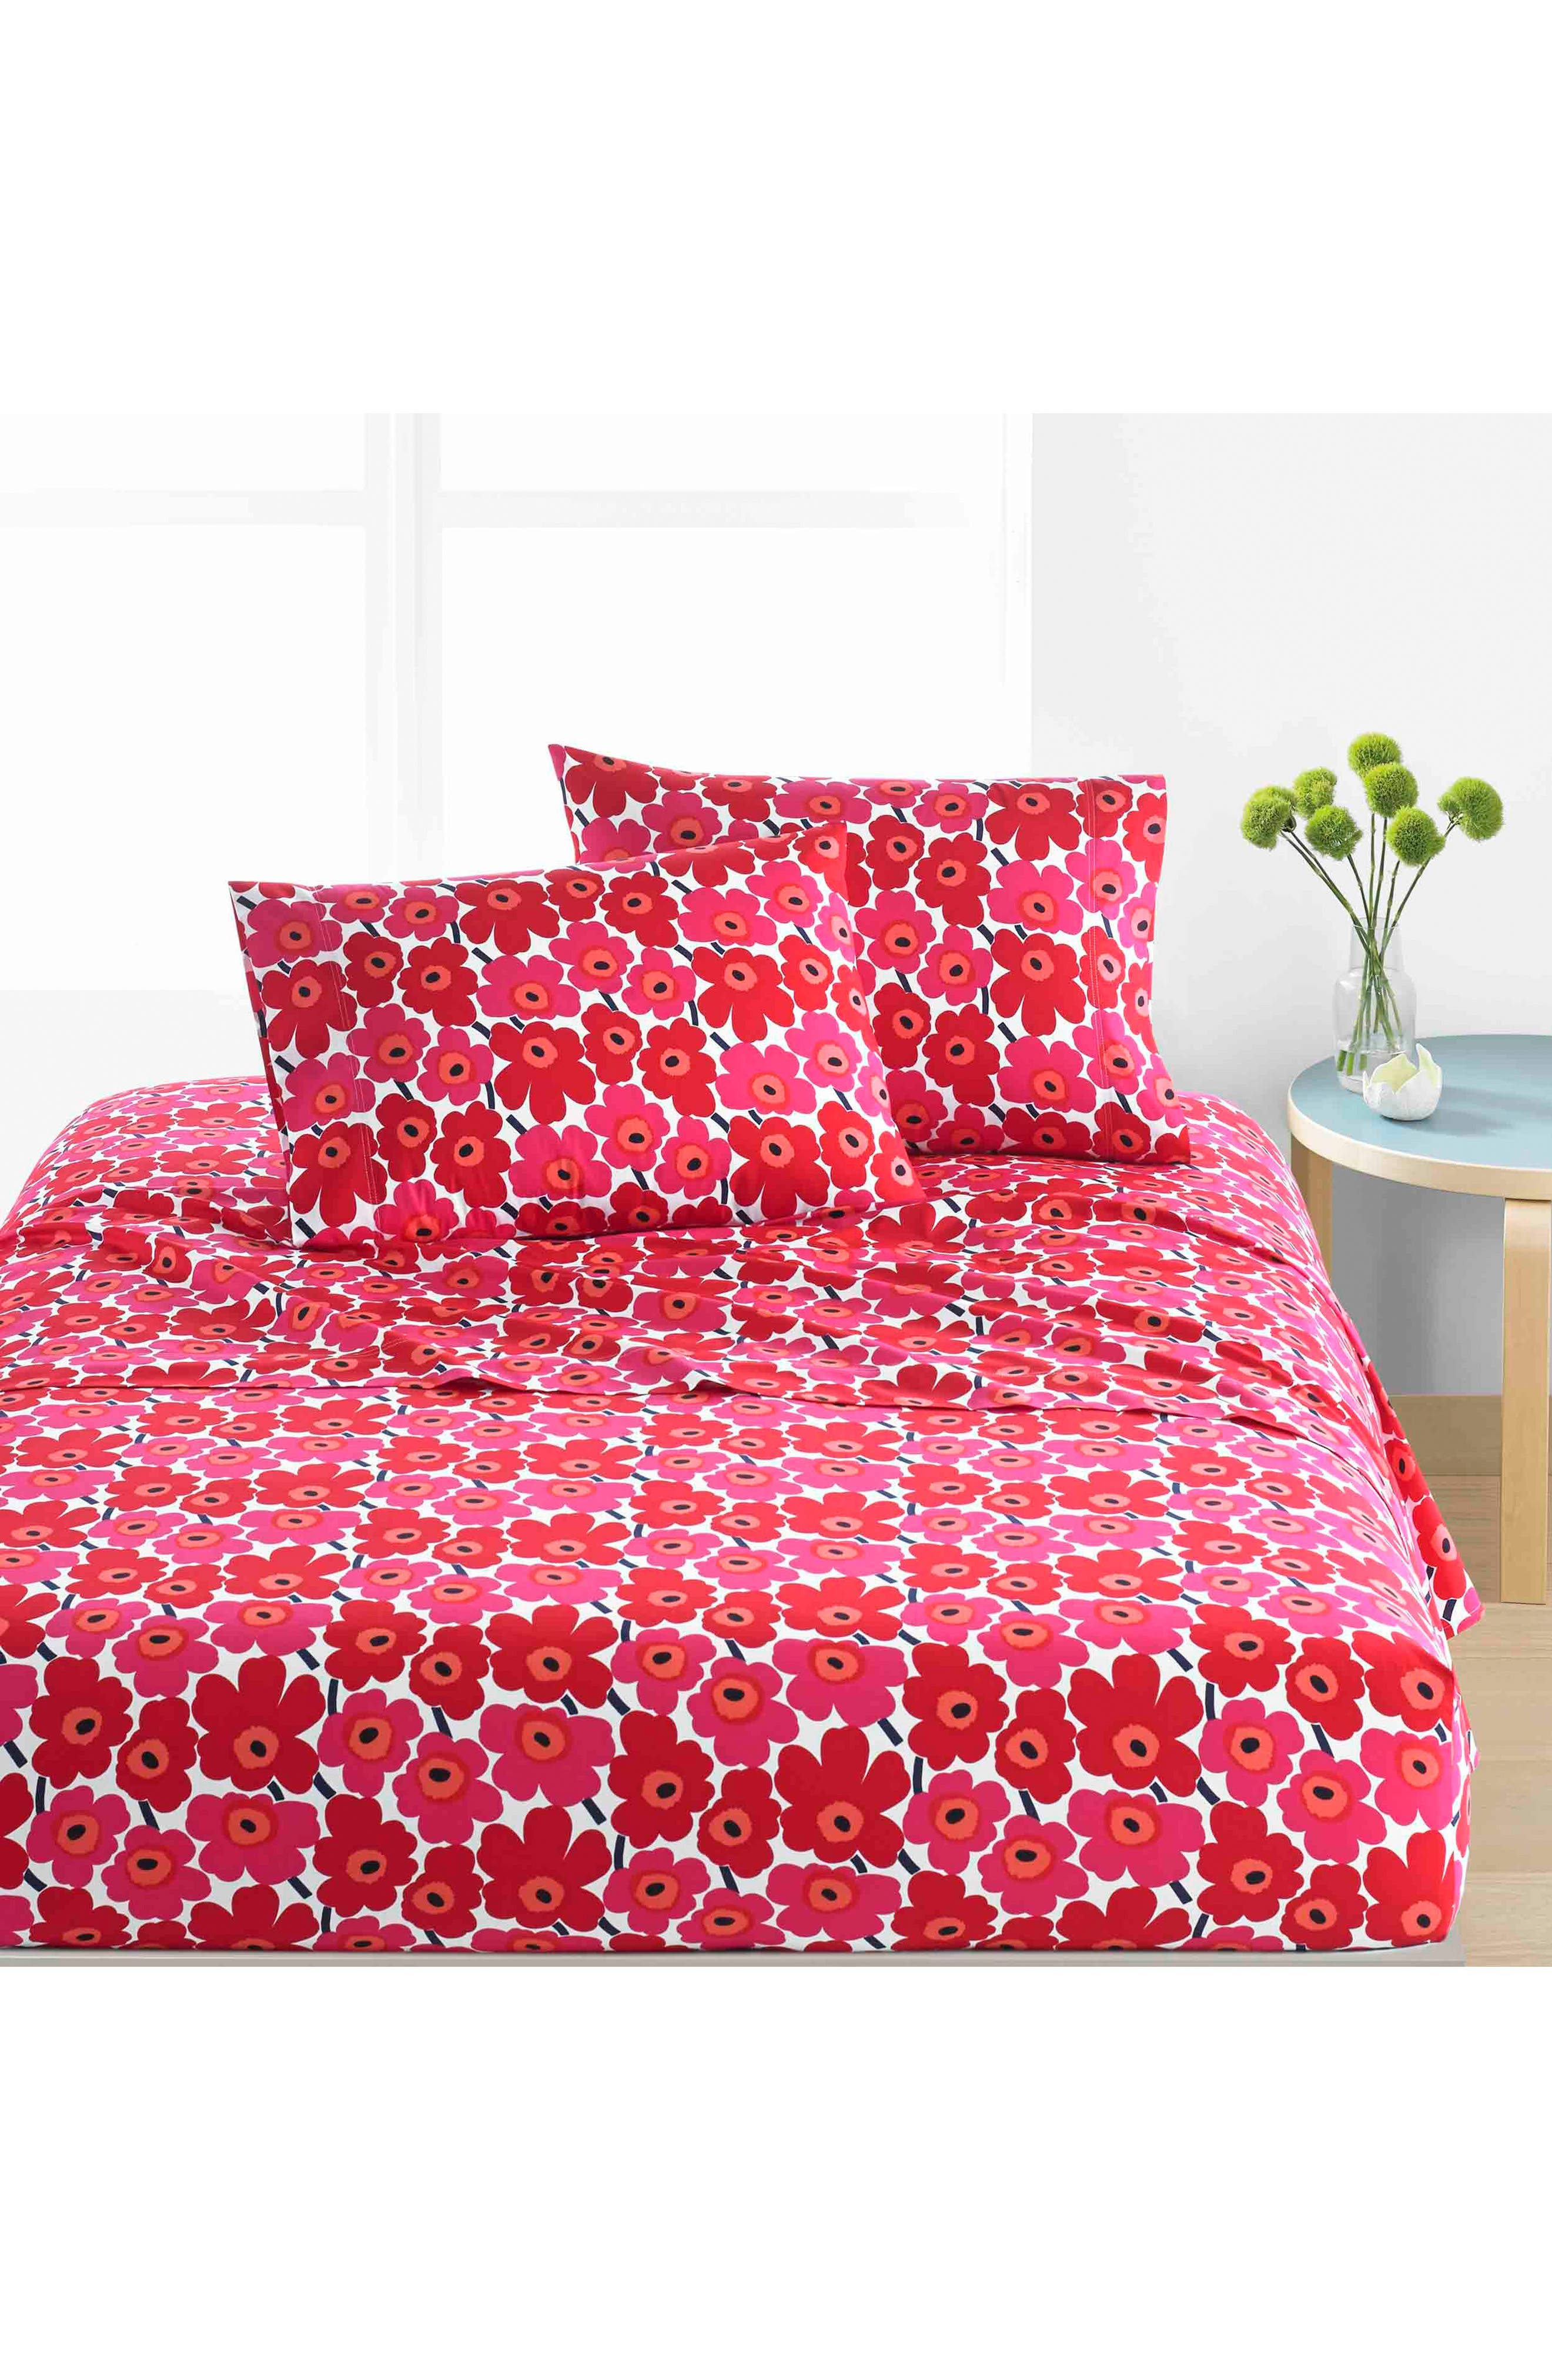 Unikko 200 Thread Count Cotton Sheet Set,                         Main,                         color, Dark Red